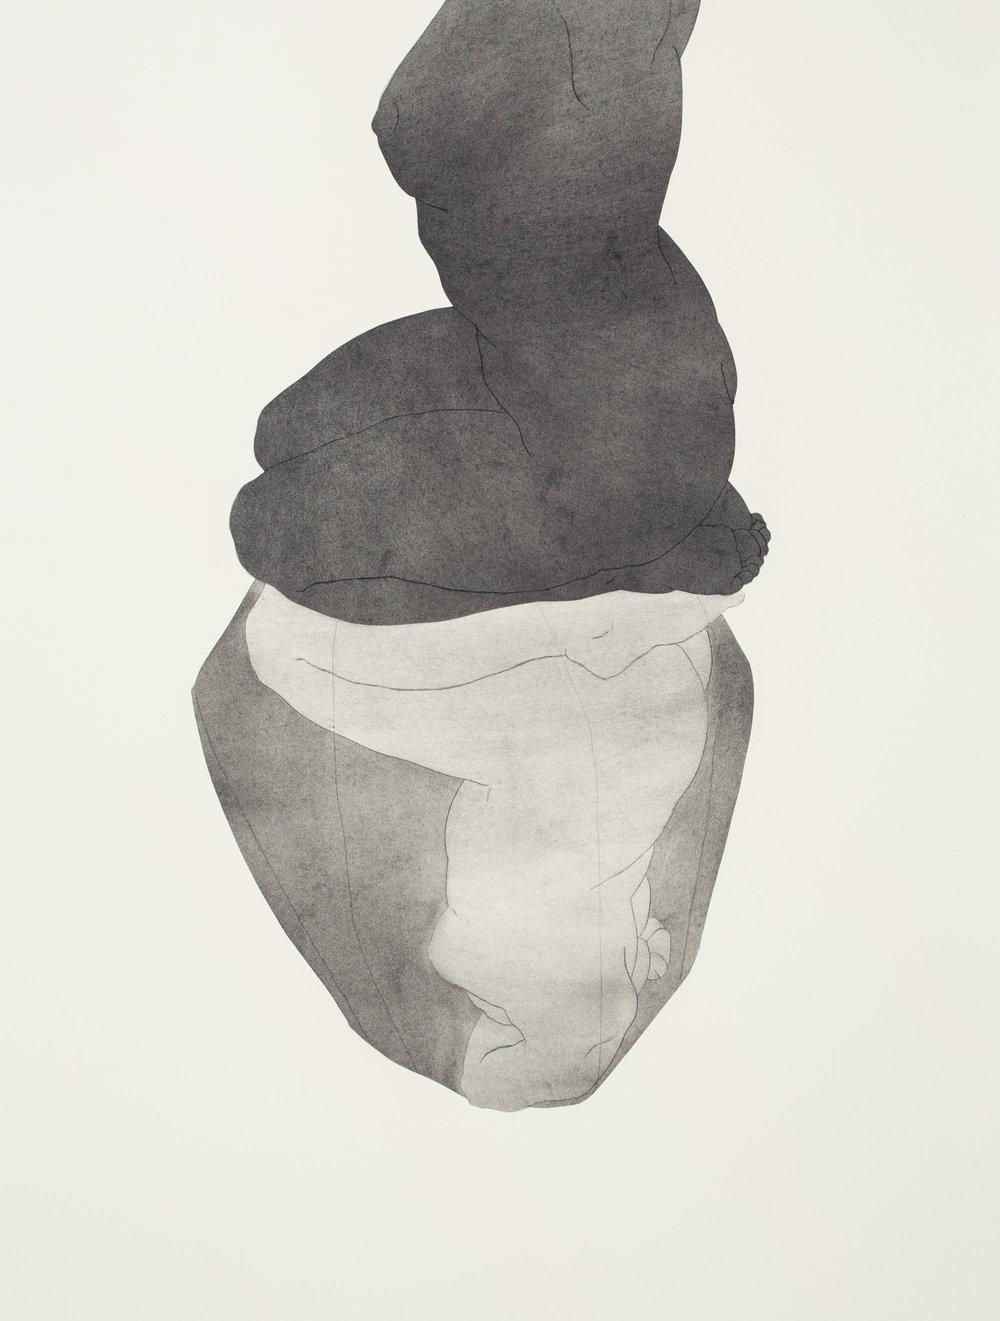 Untitled, 2014. (2014.01.001)